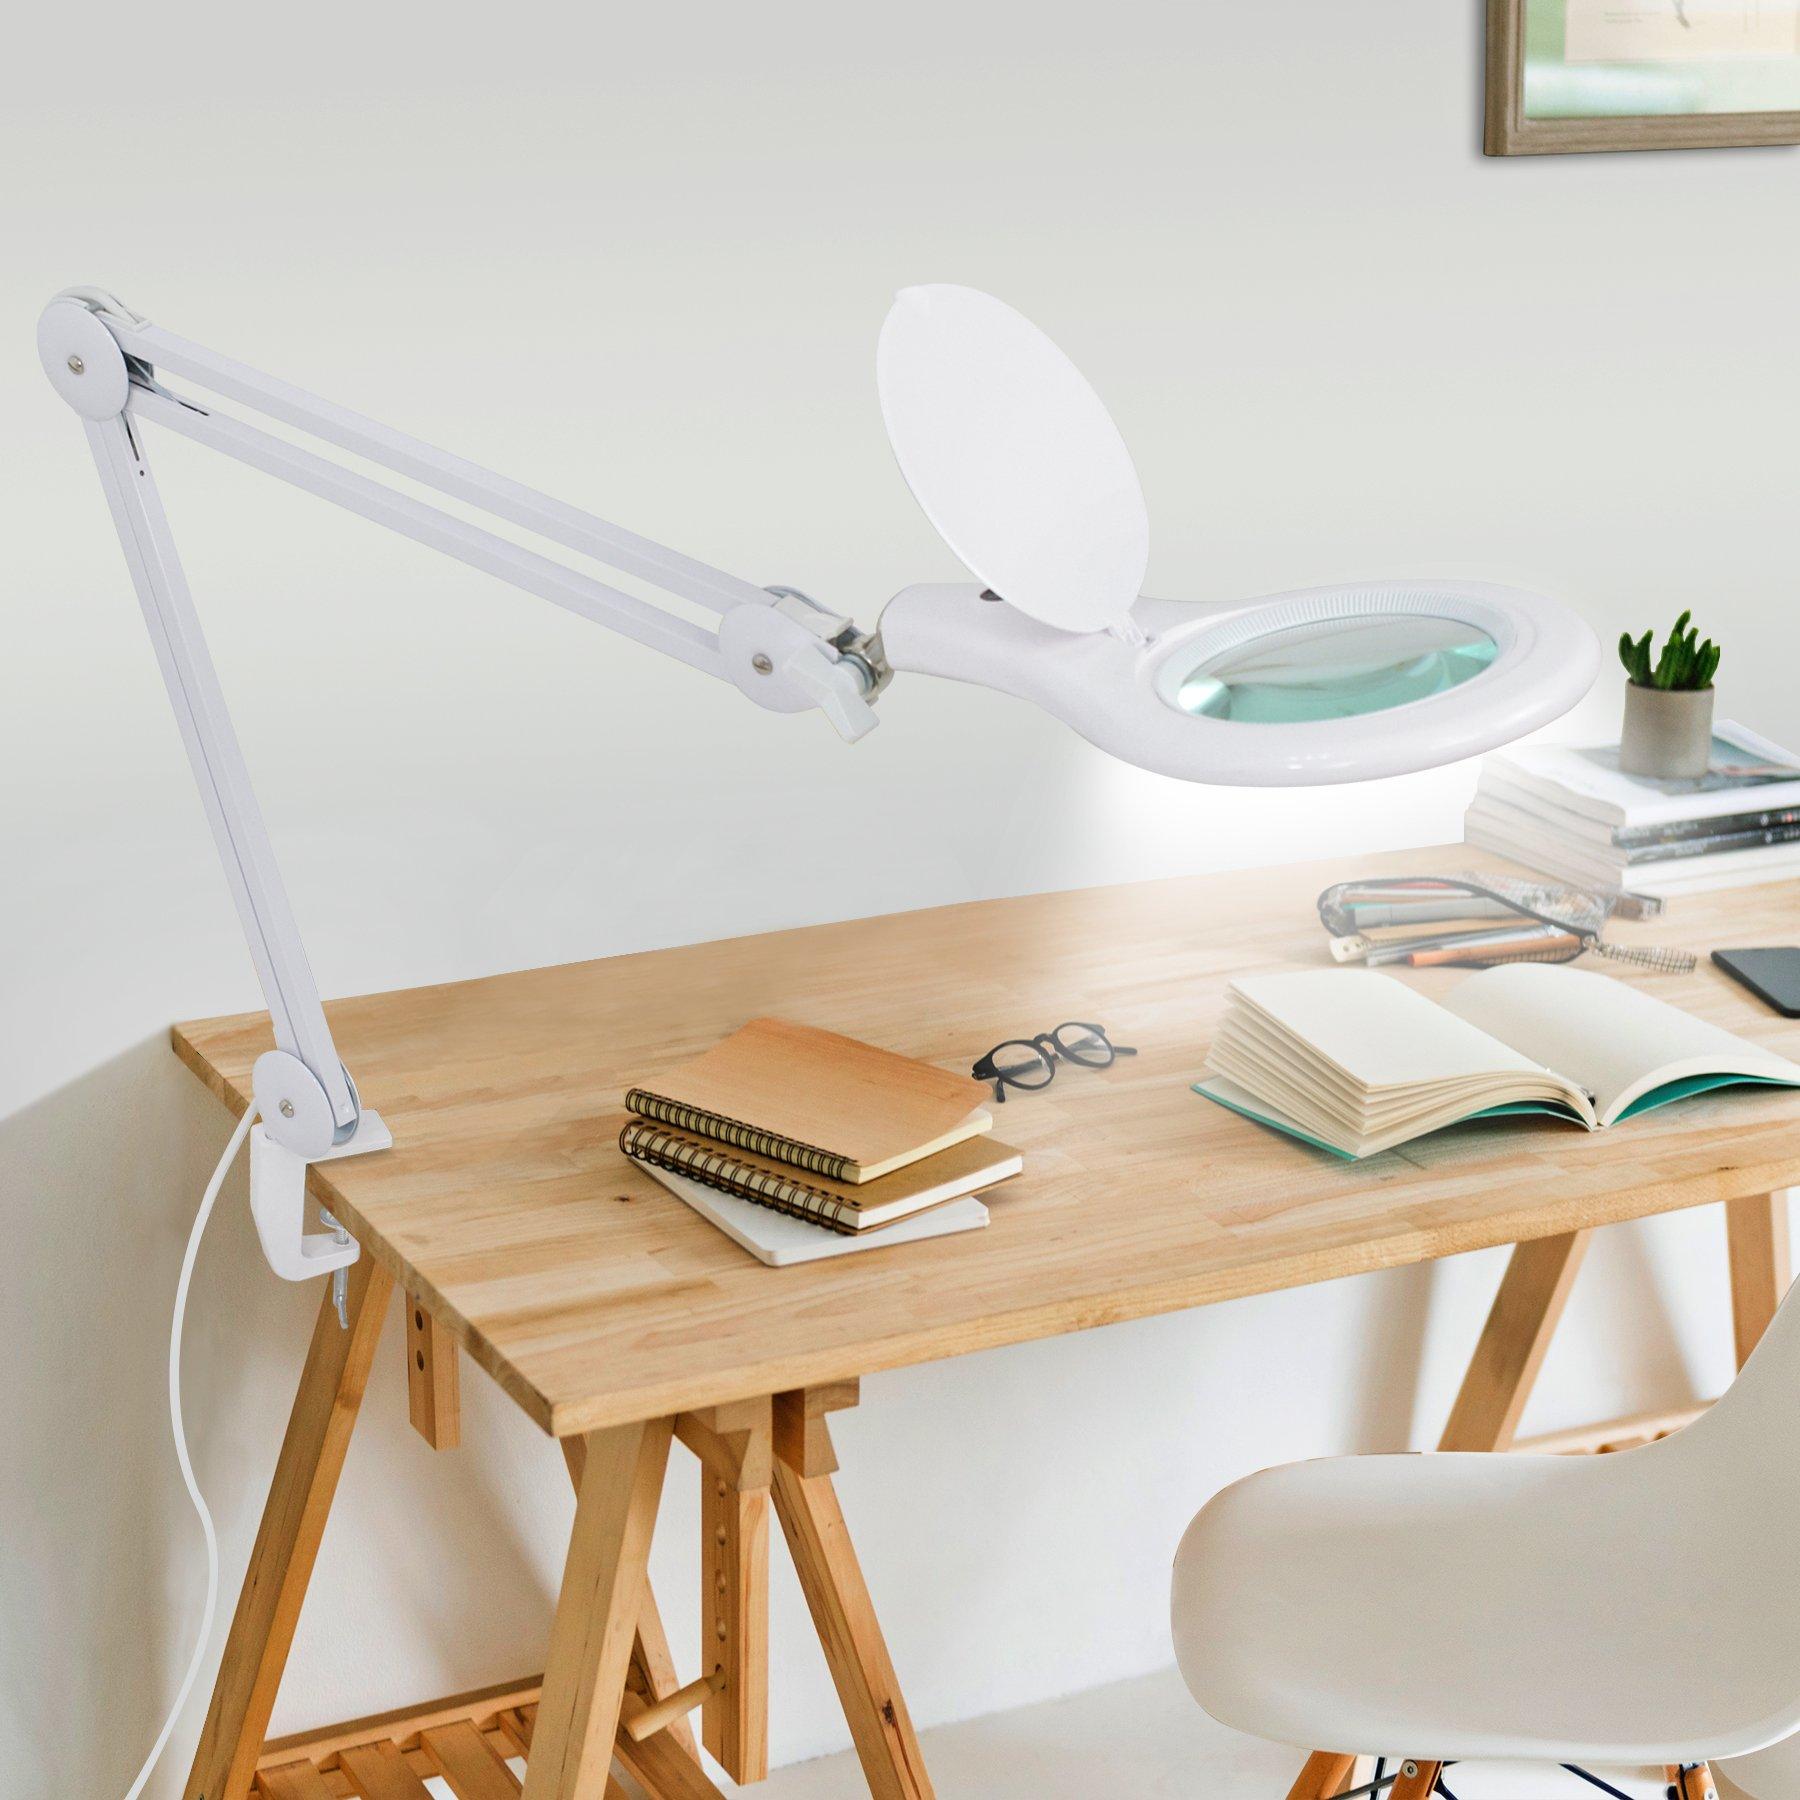 Super Deal PRO XL 2.25X LED Desk Clamp Magnifier Lamp - 56 SMD LED - Touch Sensor Switch - 360°Adjustable Swivel Arm - 225% Magnification - 5'' Lens - Desk Clamp Mount for Task Craft Or Workbench